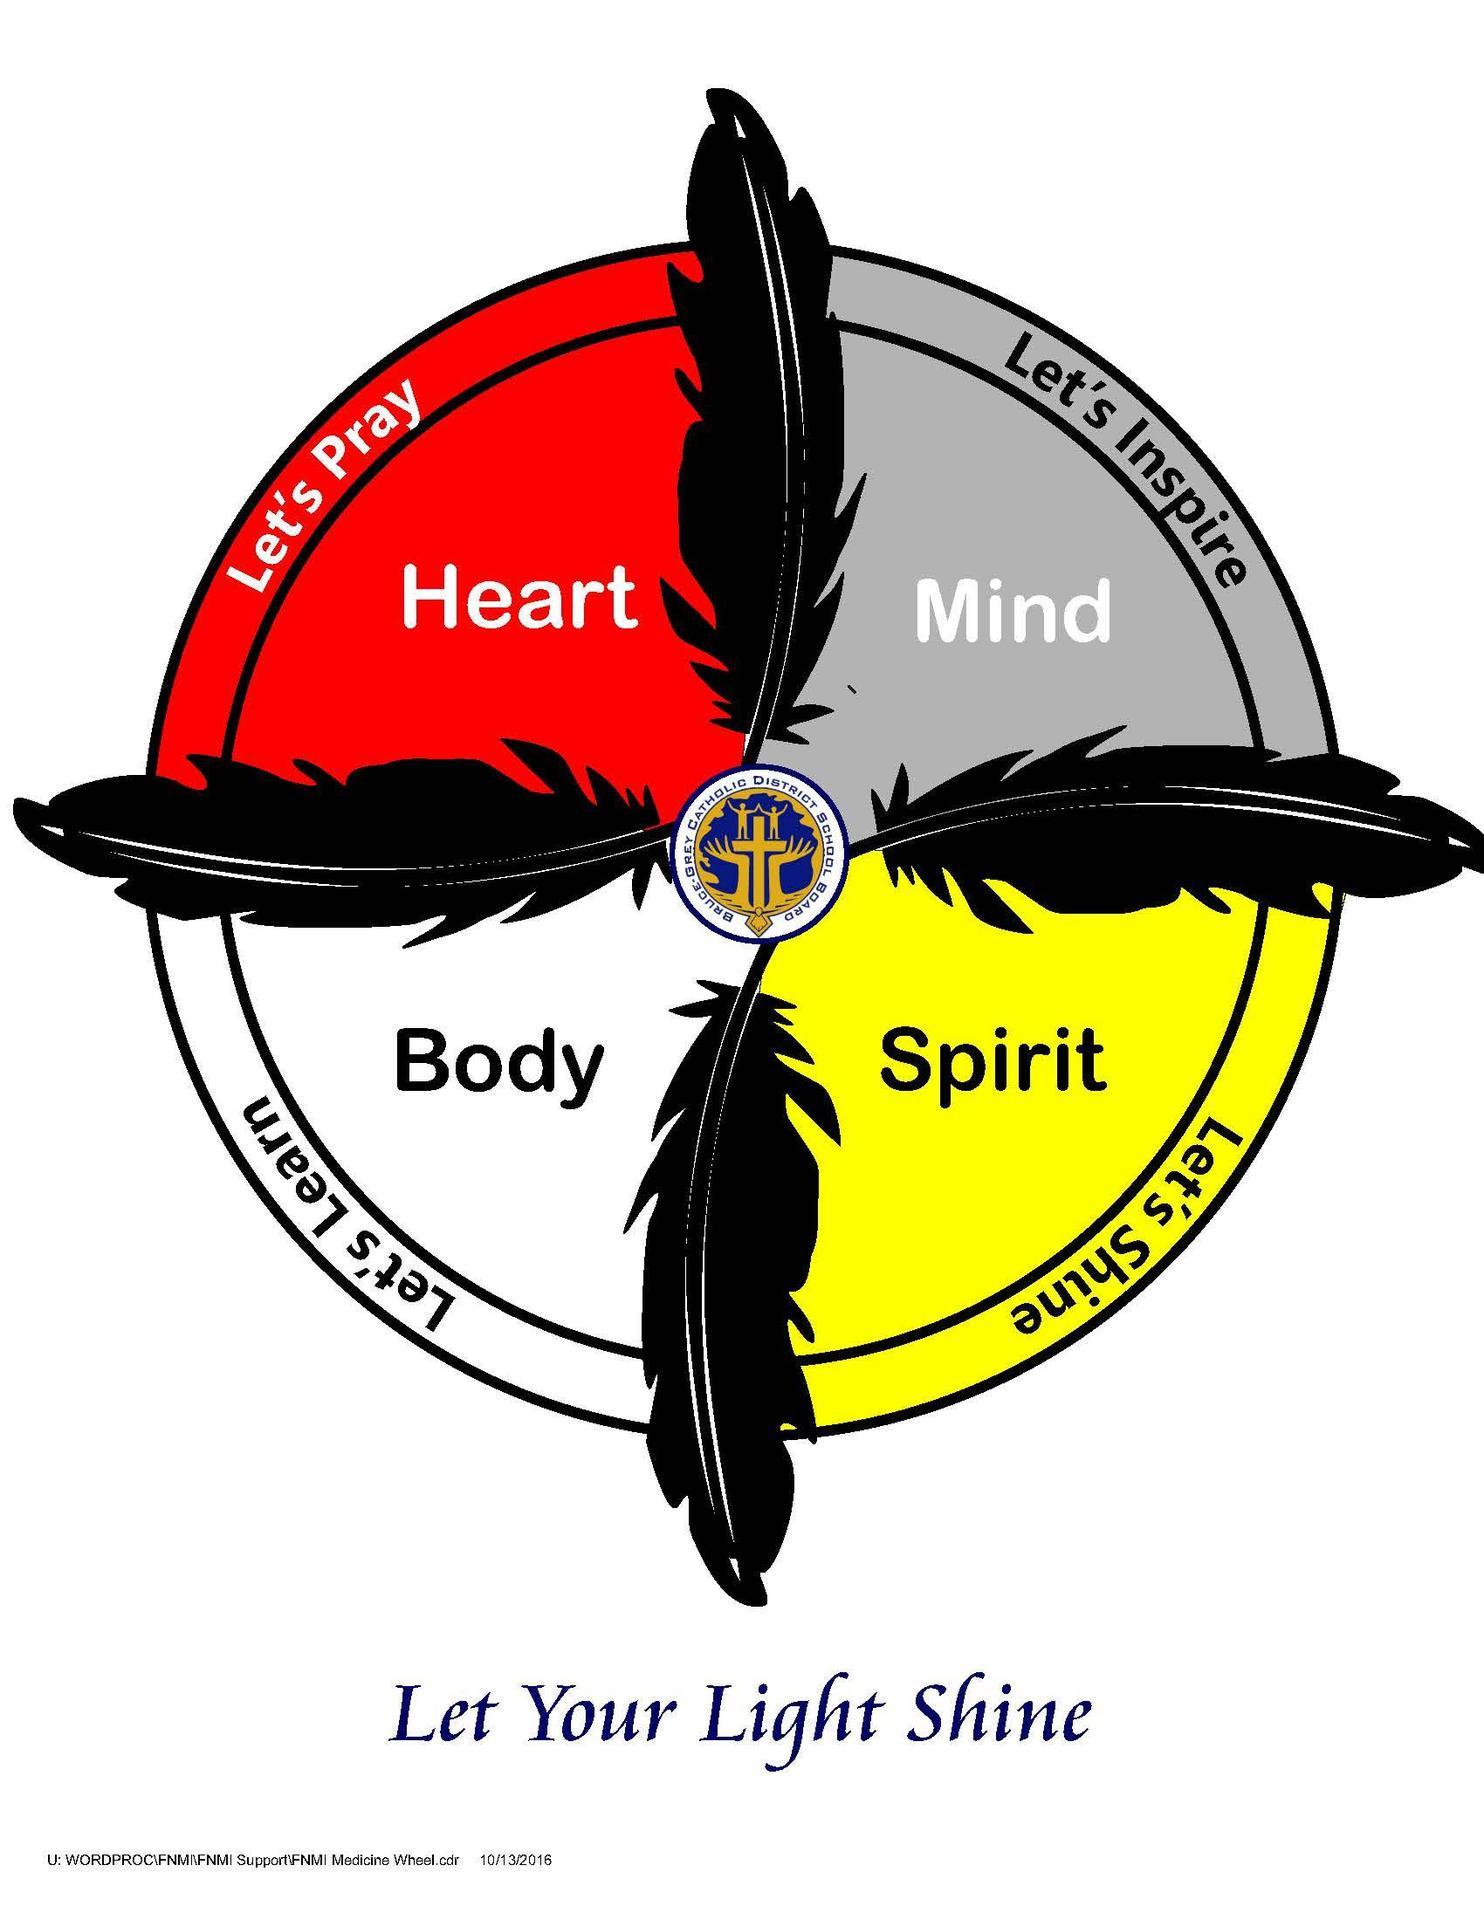 BG medicine wheel graphic